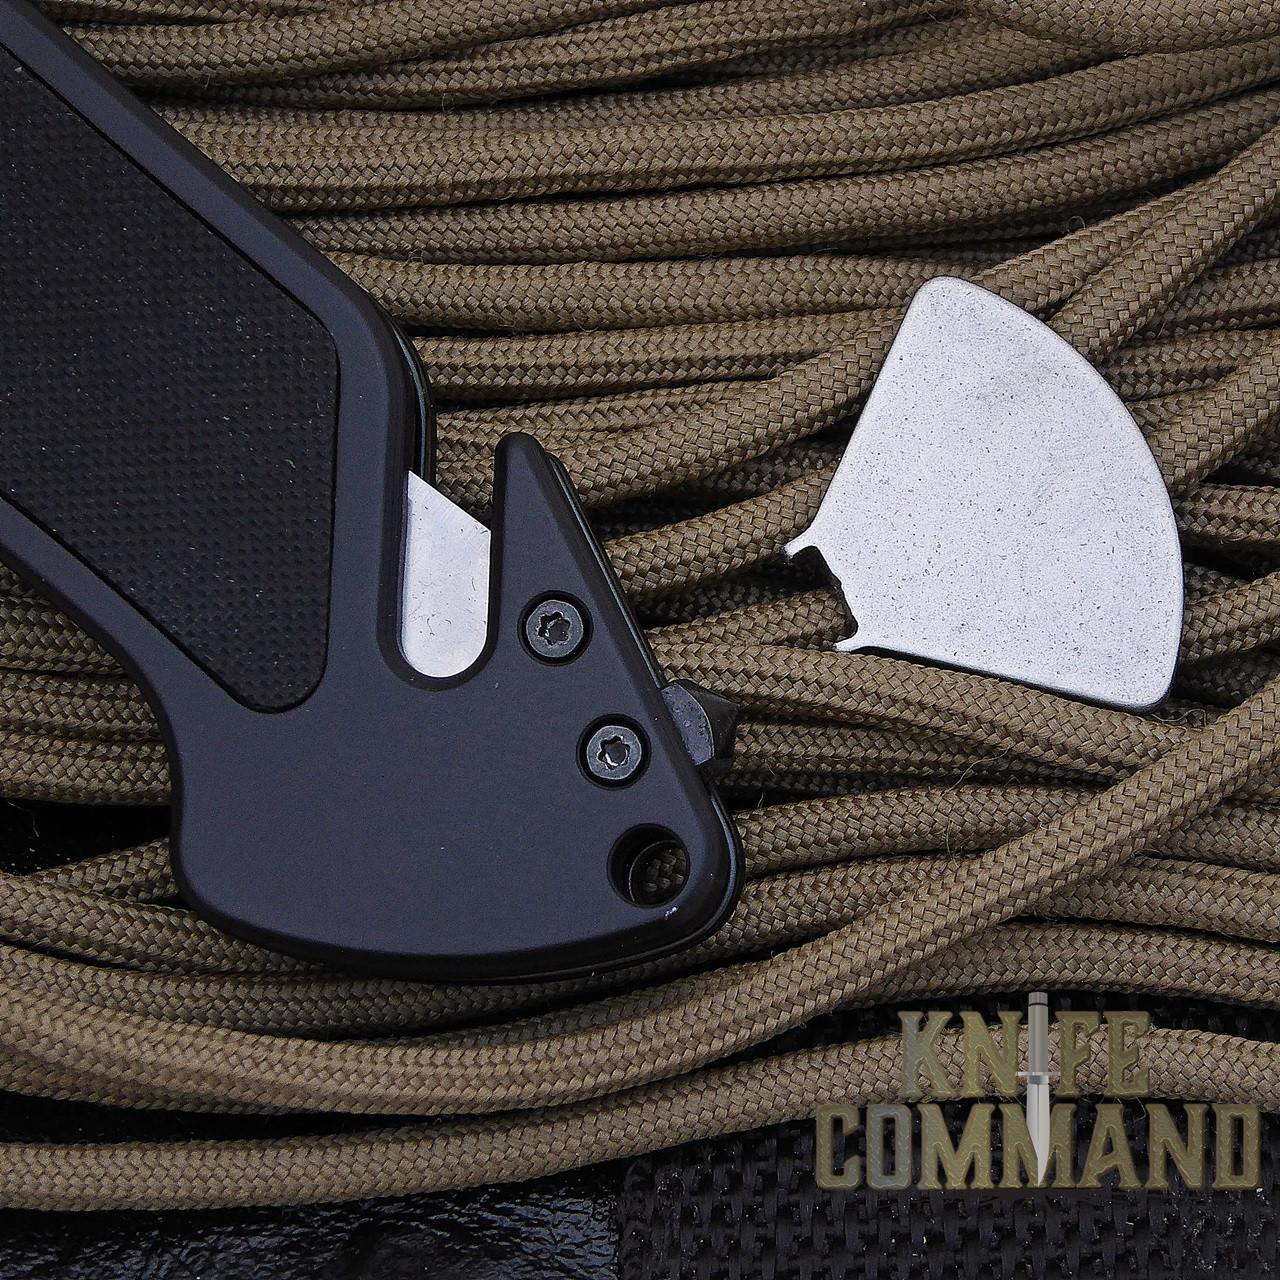 Eickhorn Solingen PRT VIII Black Tactical Emergency Rescue Knife.  Belt cutter, glass breaker, pivot tool.